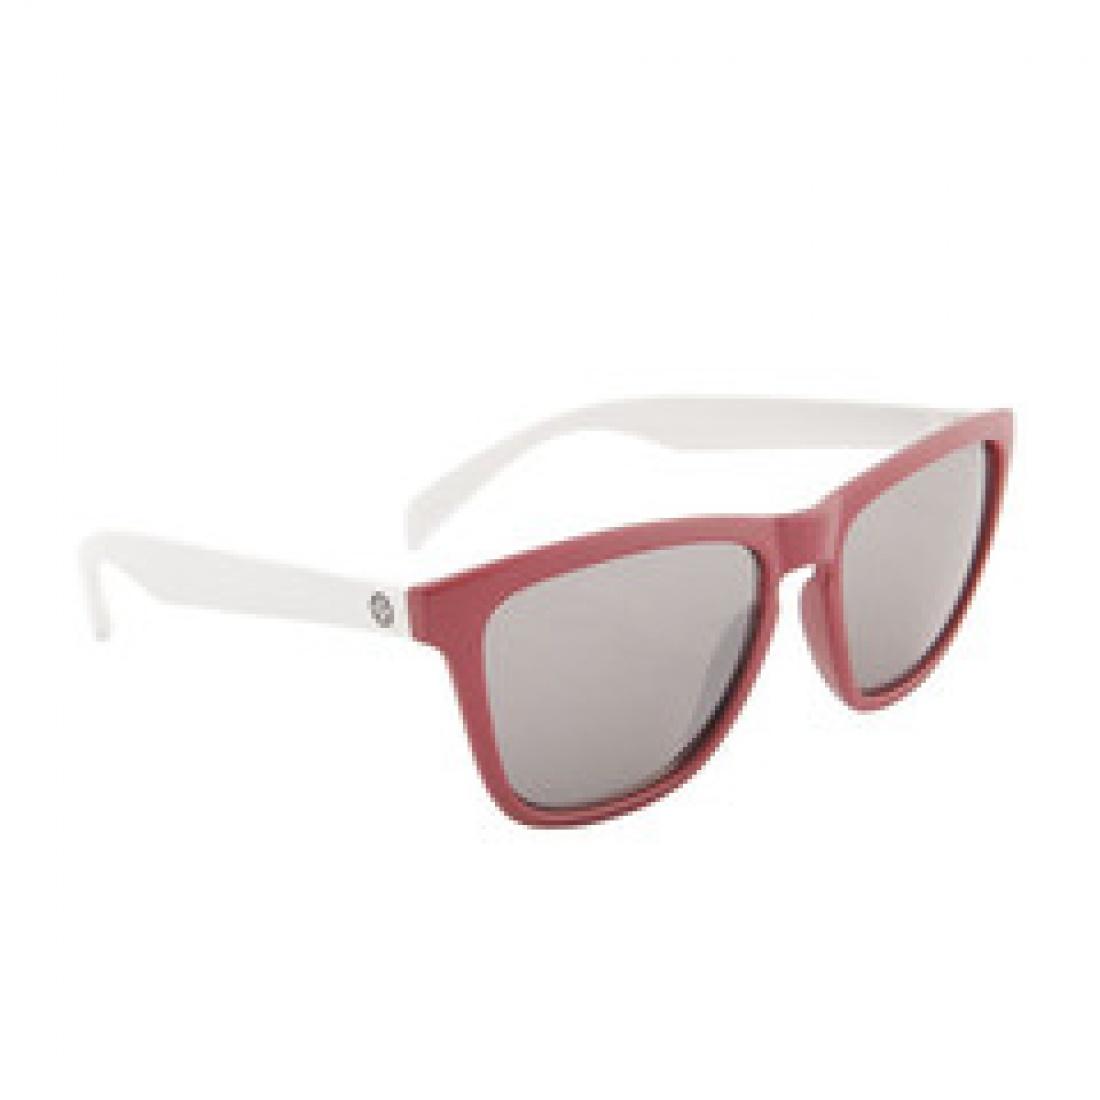 IND-Marina Sunglasses Red/Wht OS Unisex